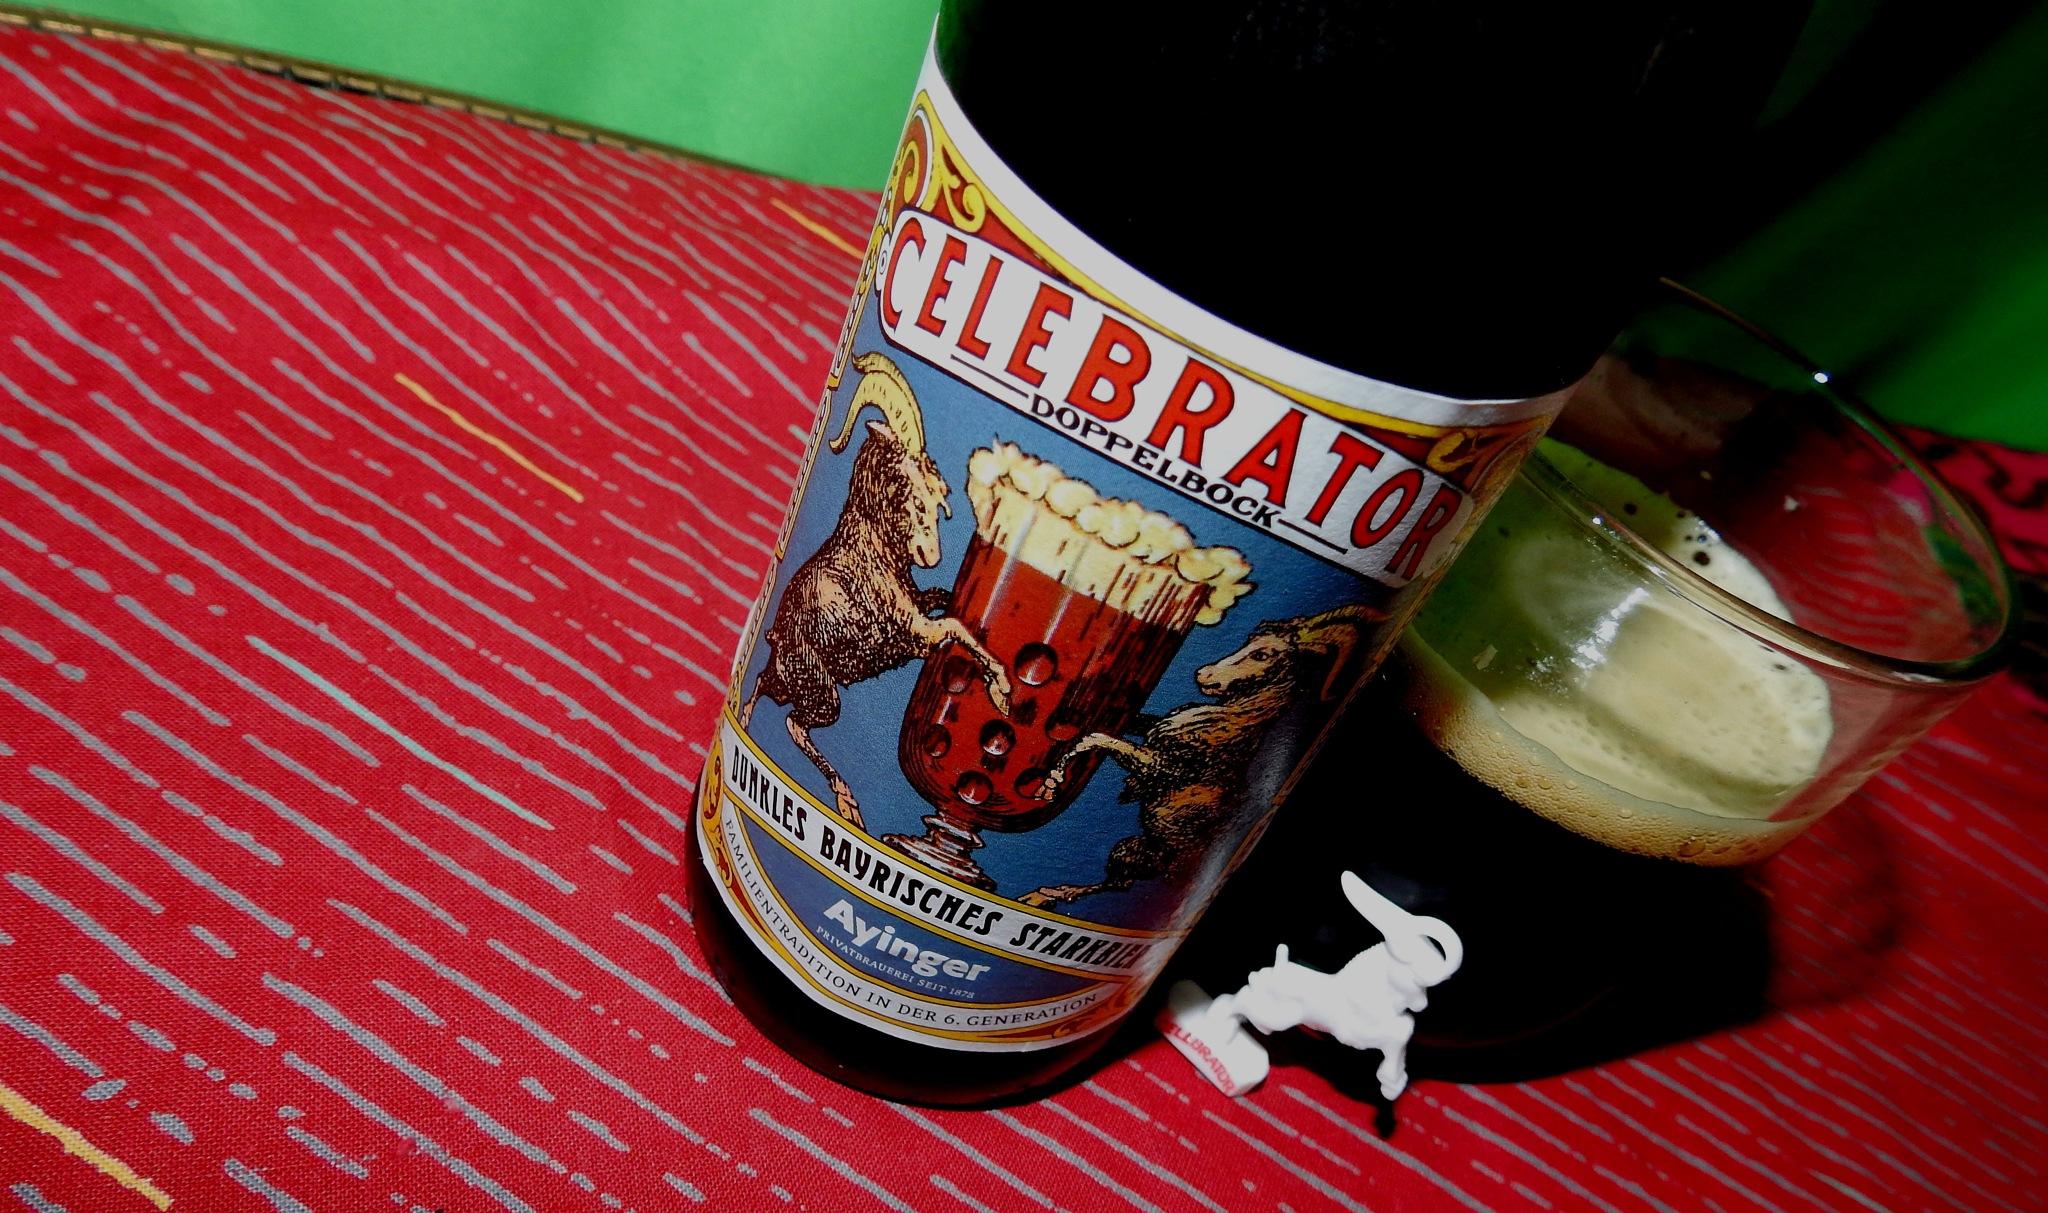 German Beer - Celebrator - Dunkles Bayrisches Starkbier - 6,7° - Ayinger - Aying Germany - 2 by Arnaldo De Lisio